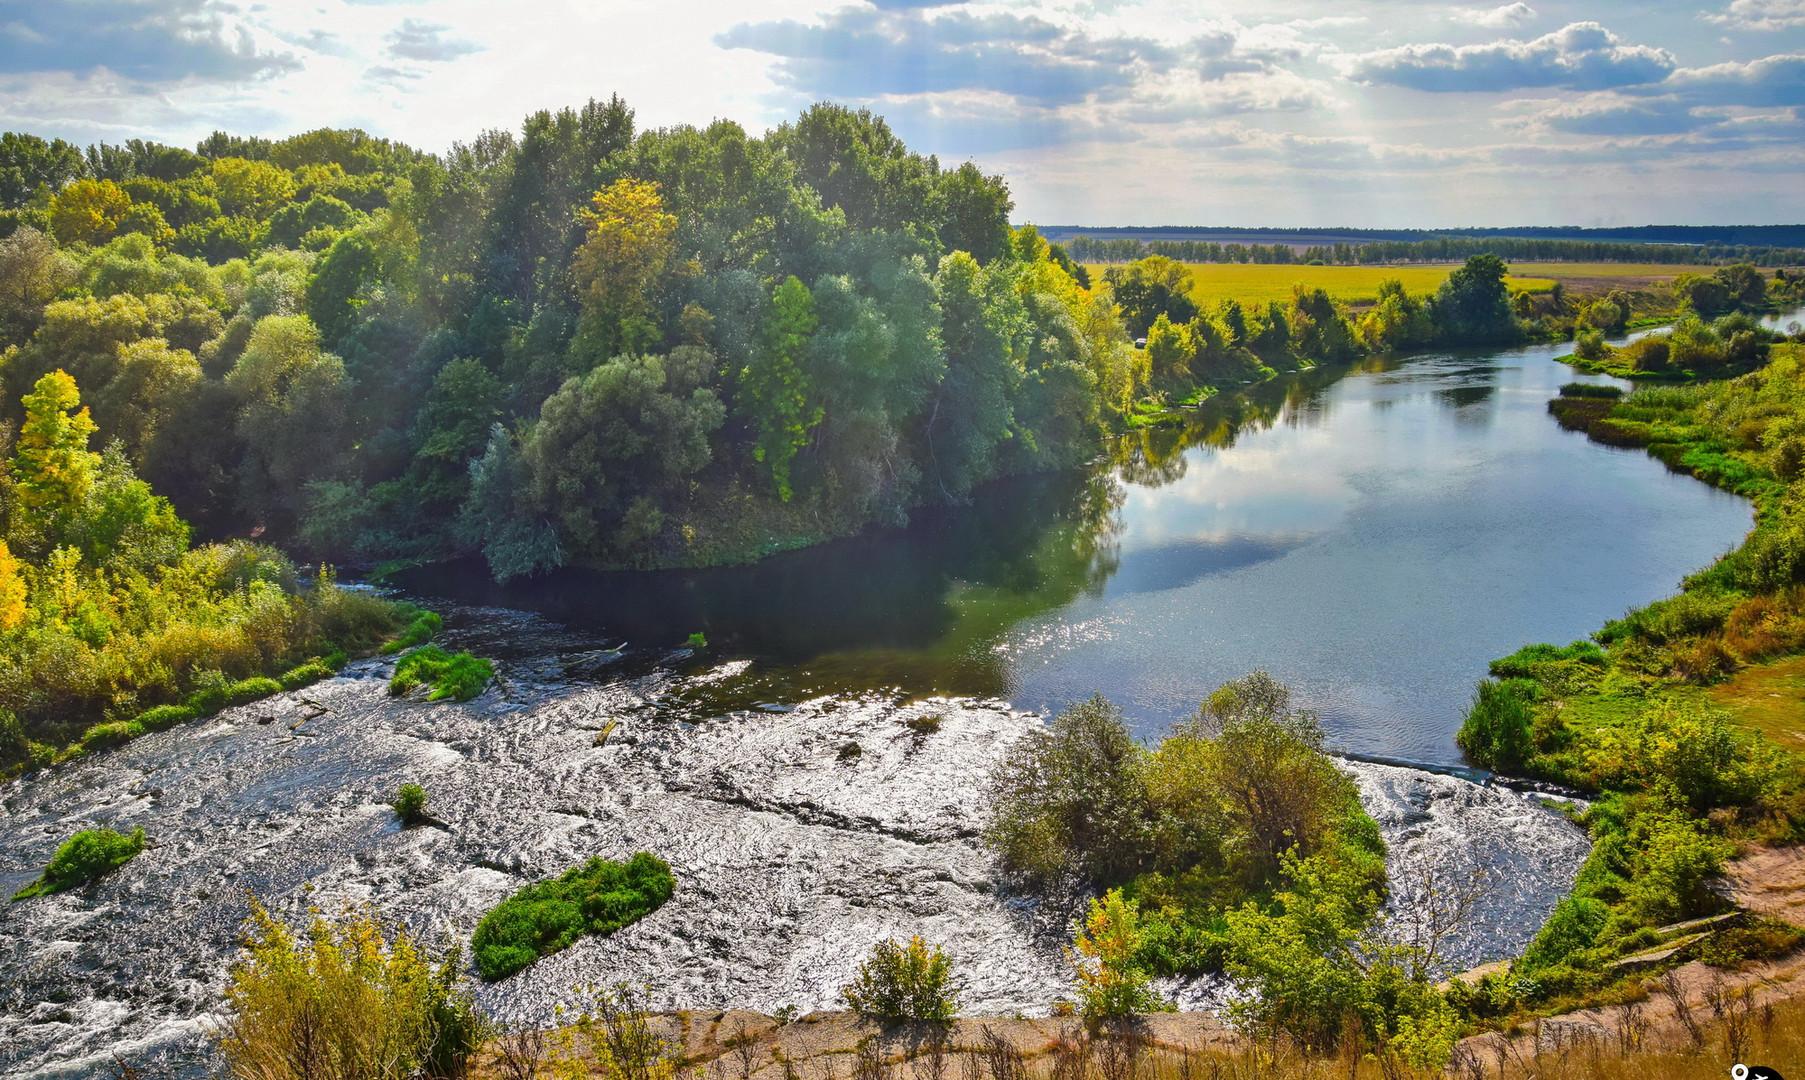 Кураповские скалы, Курапово